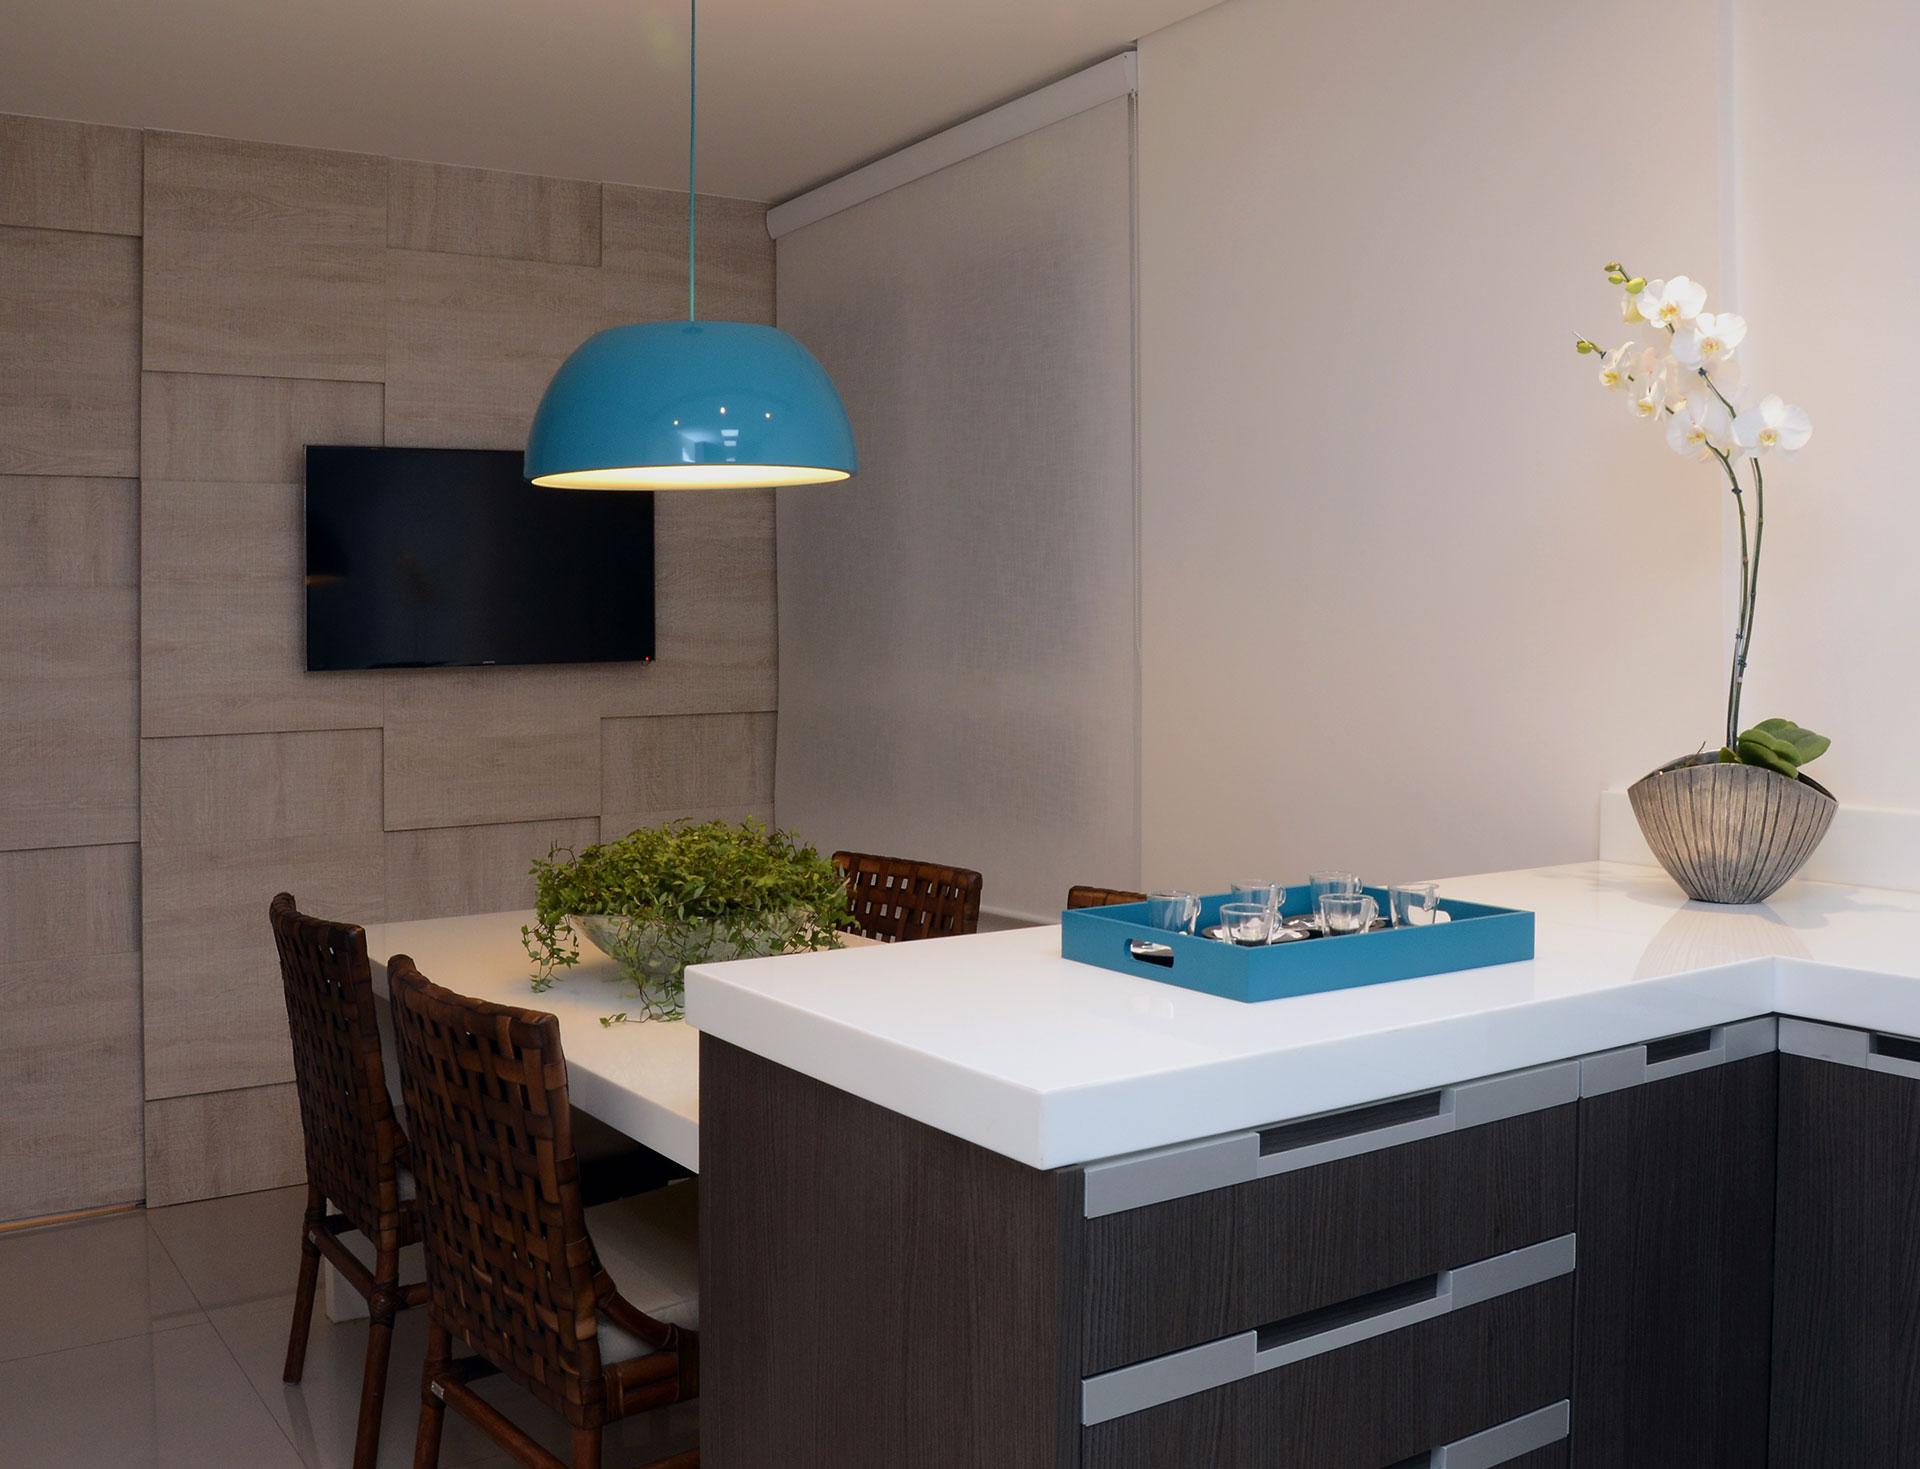 portfolio-cynthia-rolnik-apartamento2-05